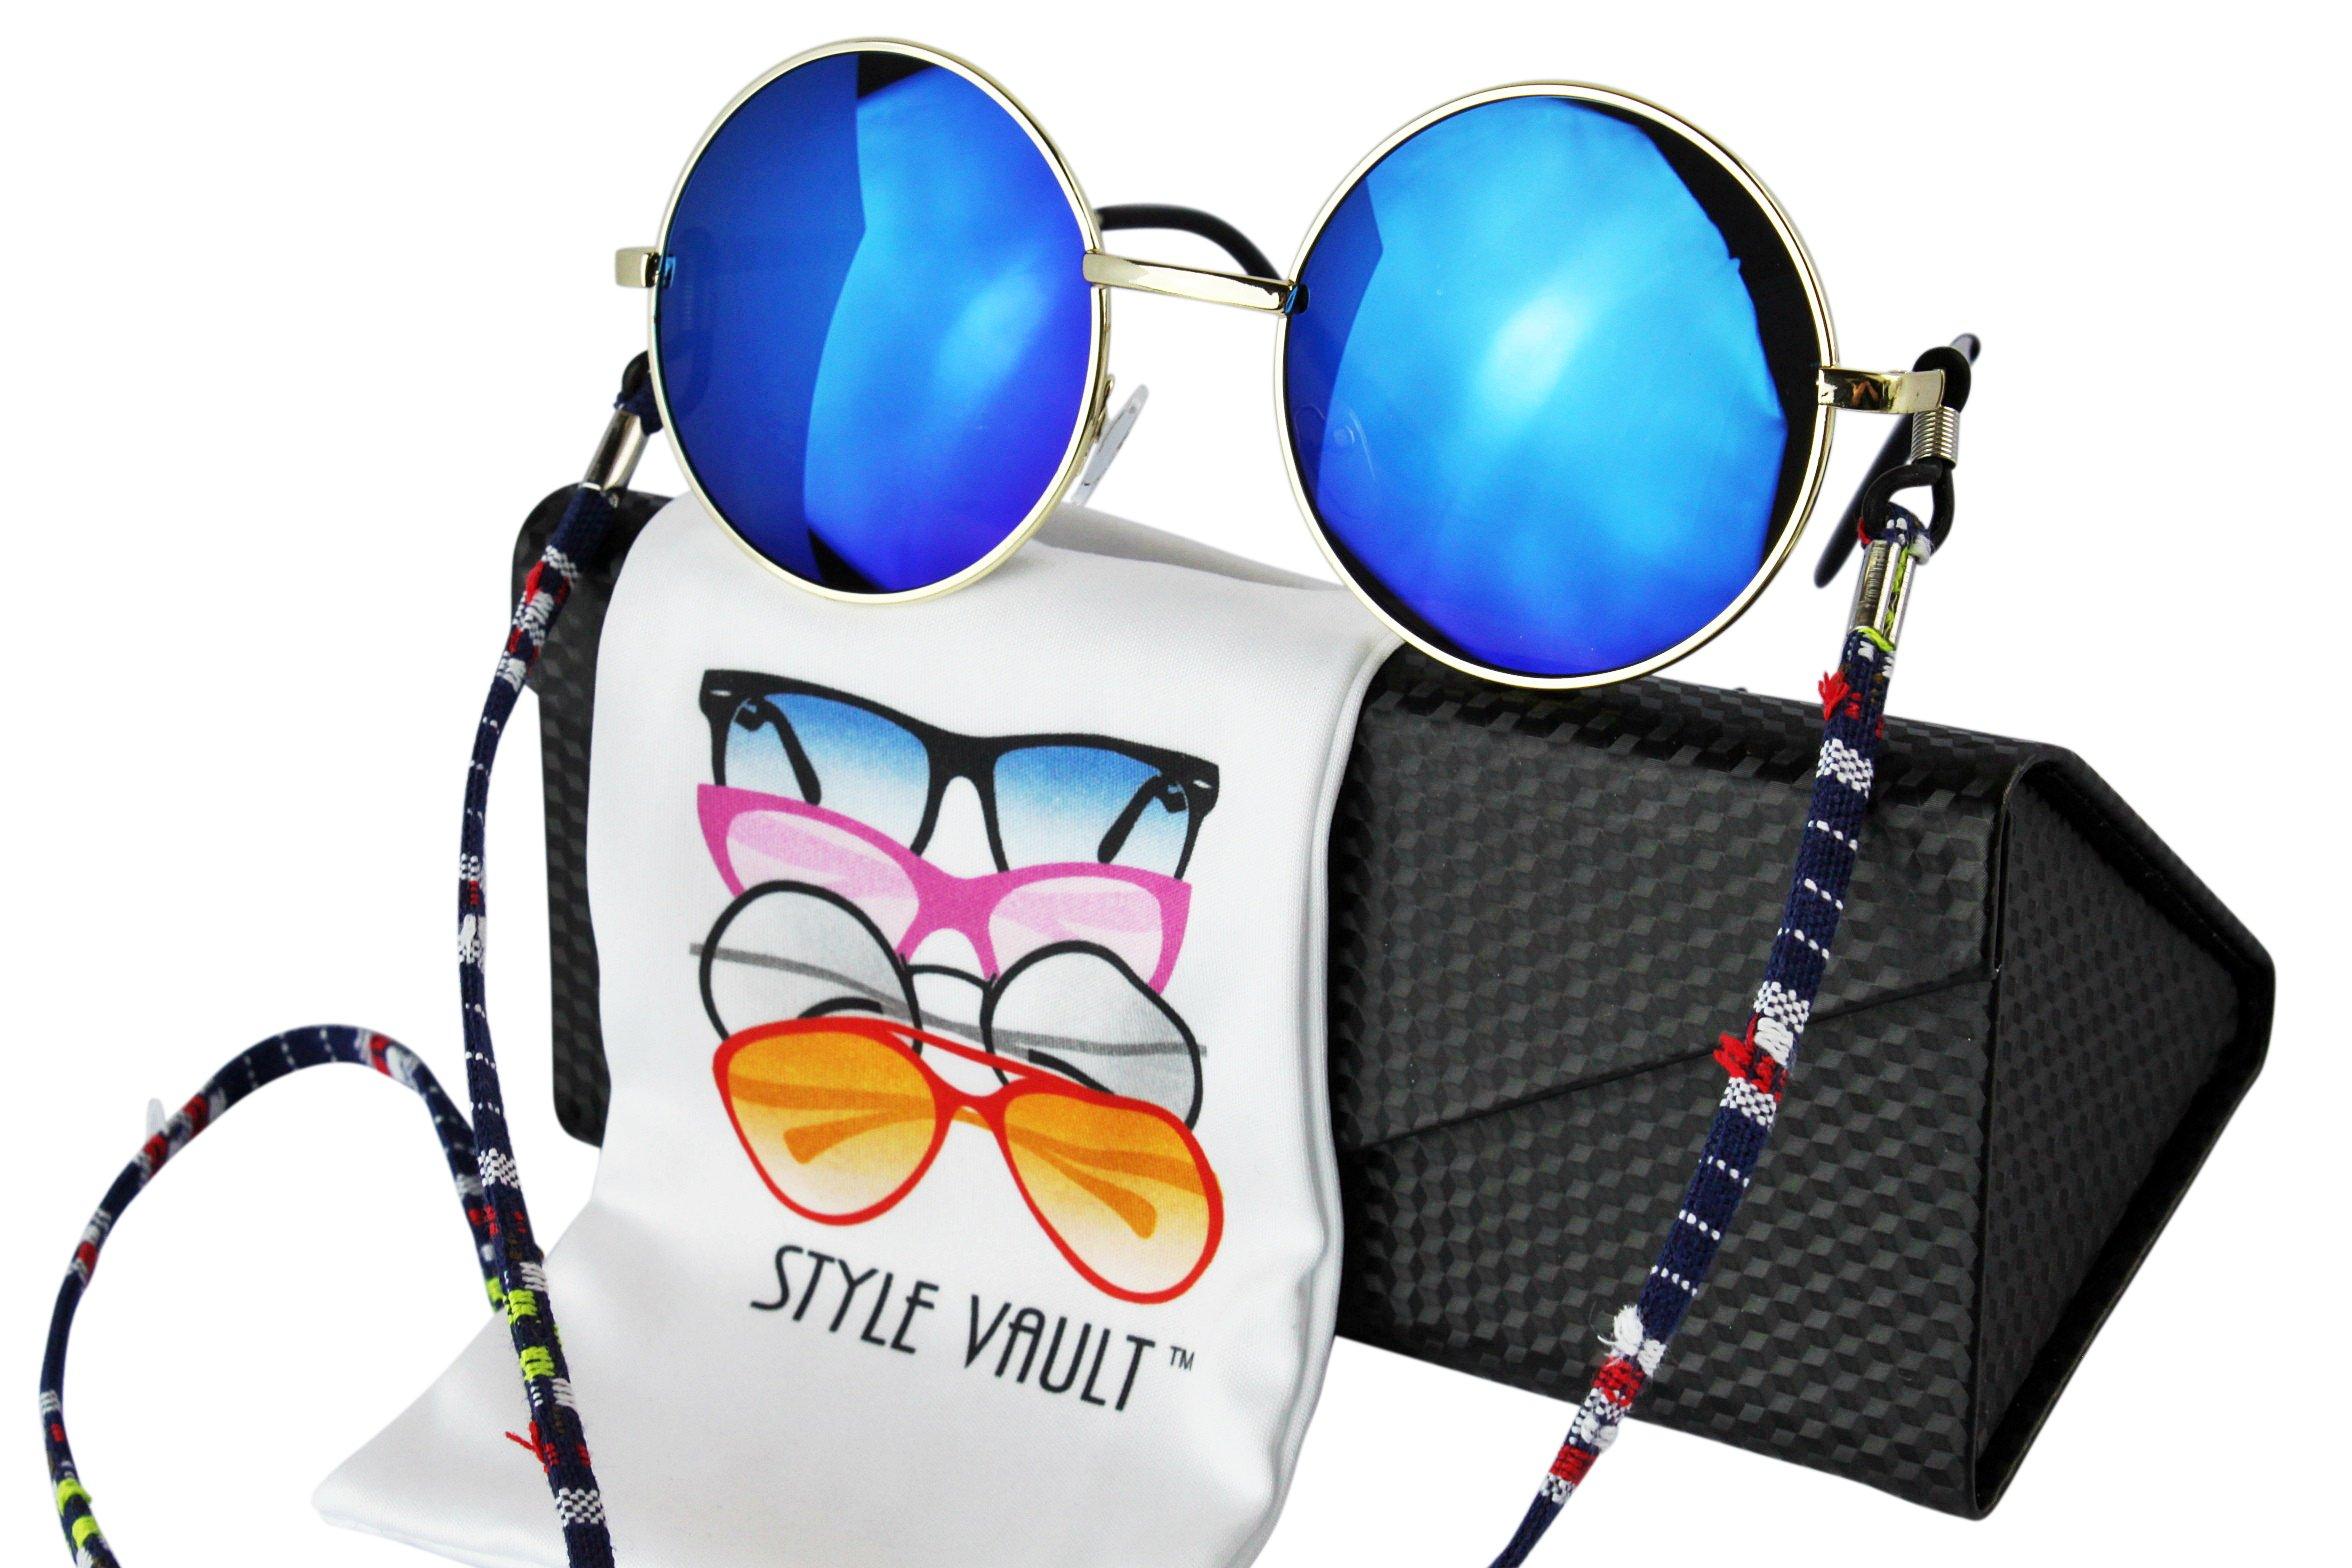 W134-ec Style Vault Retro Hippie Metal Round Sunglasses with Cotton Neck String (C016 Gold-blue mirror, uv400)